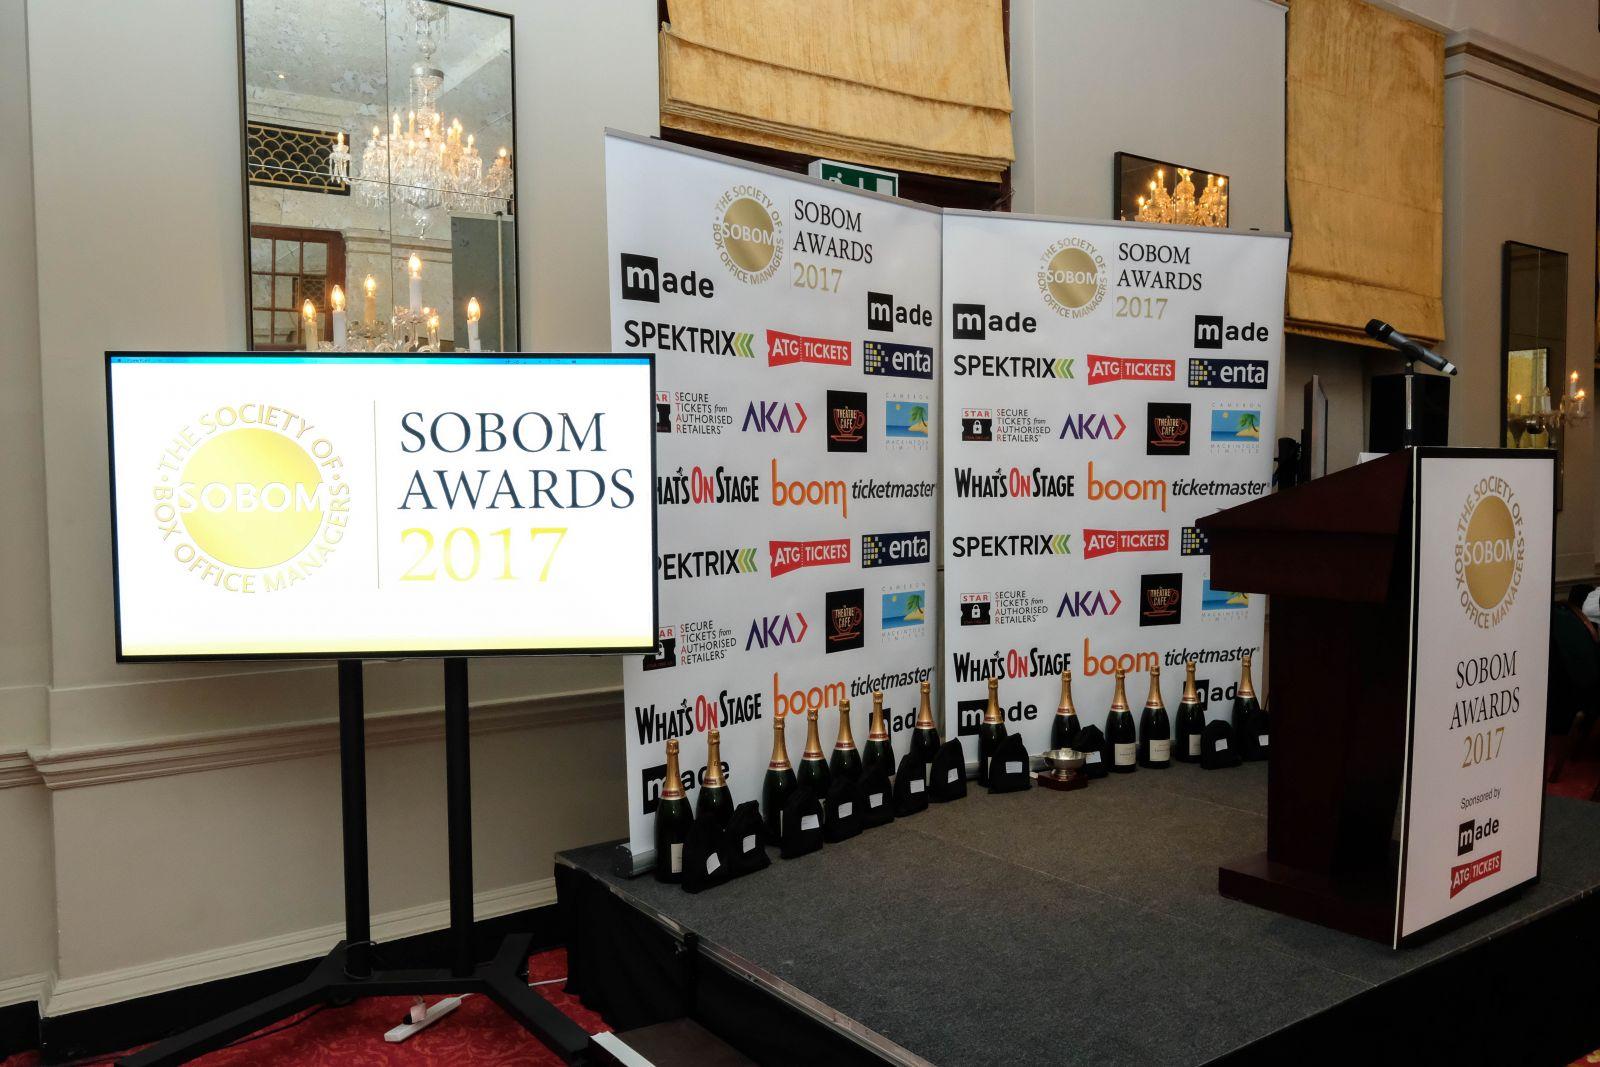 SOBOM Awards 2017